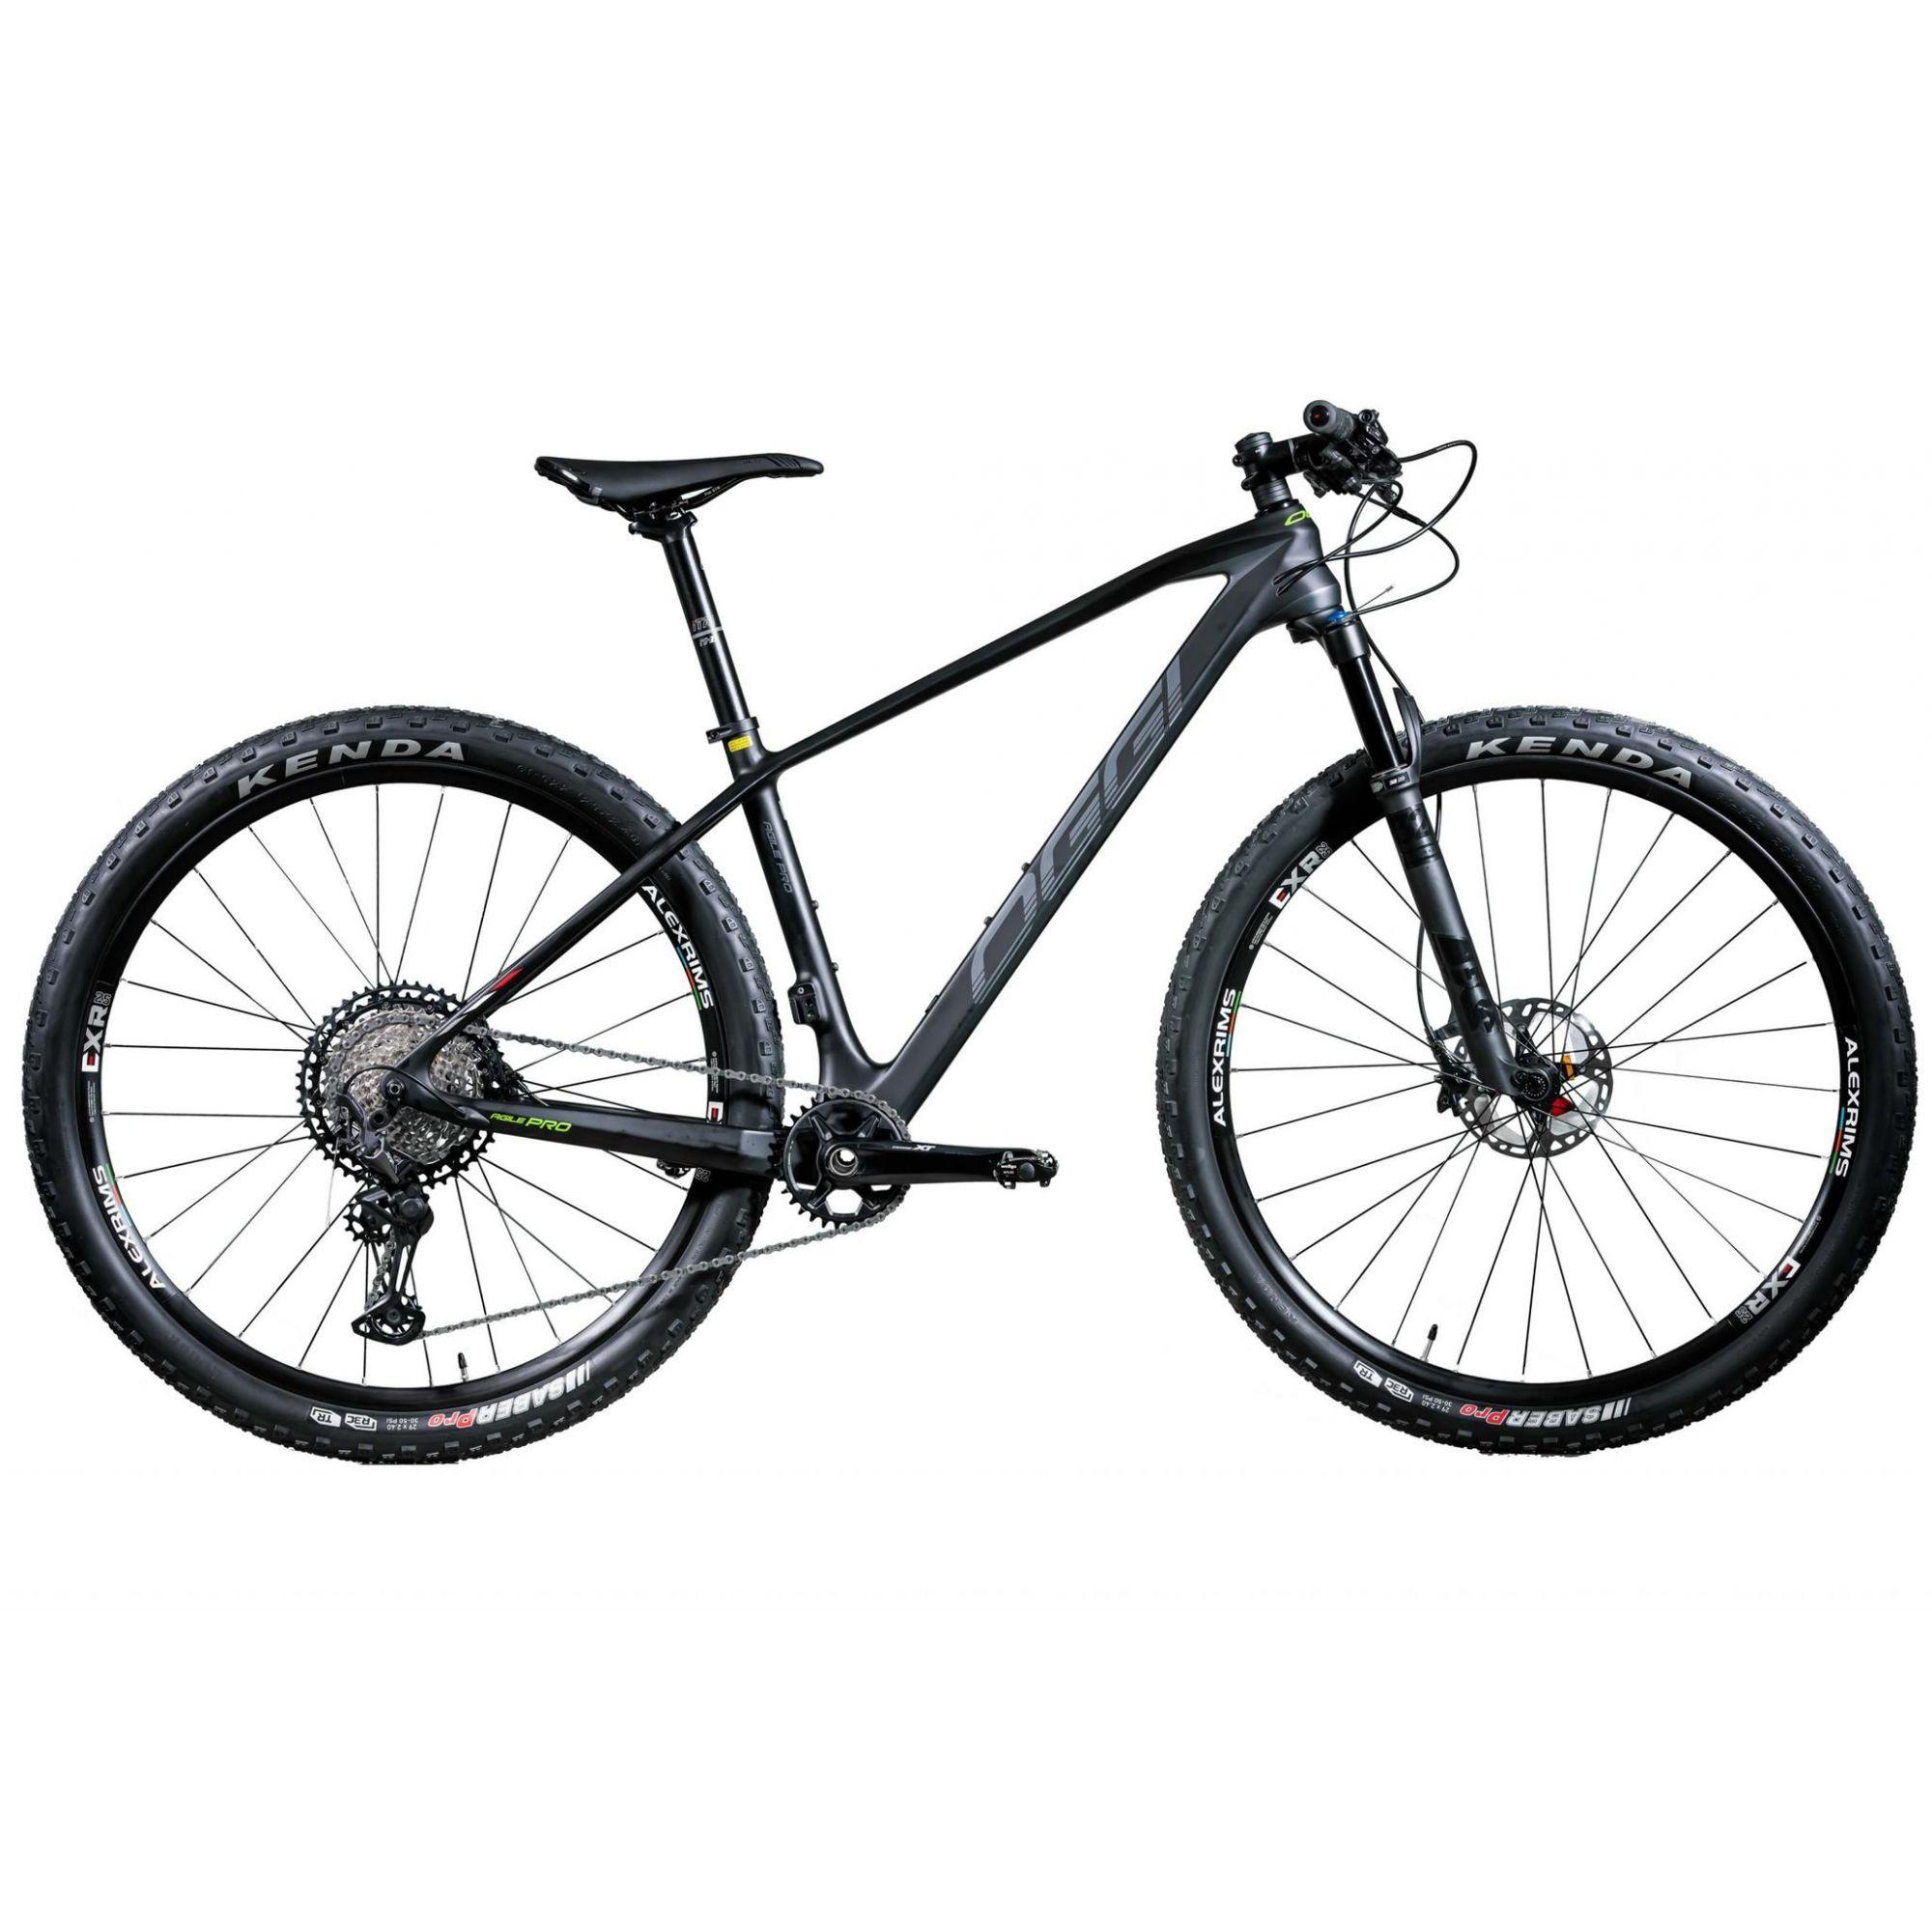 Bicicleta OGGI Agile PRO XT aro 29 2020 - 12V Shimano XT - Suspensão FOX 32A Float SC - Preto/Grafite